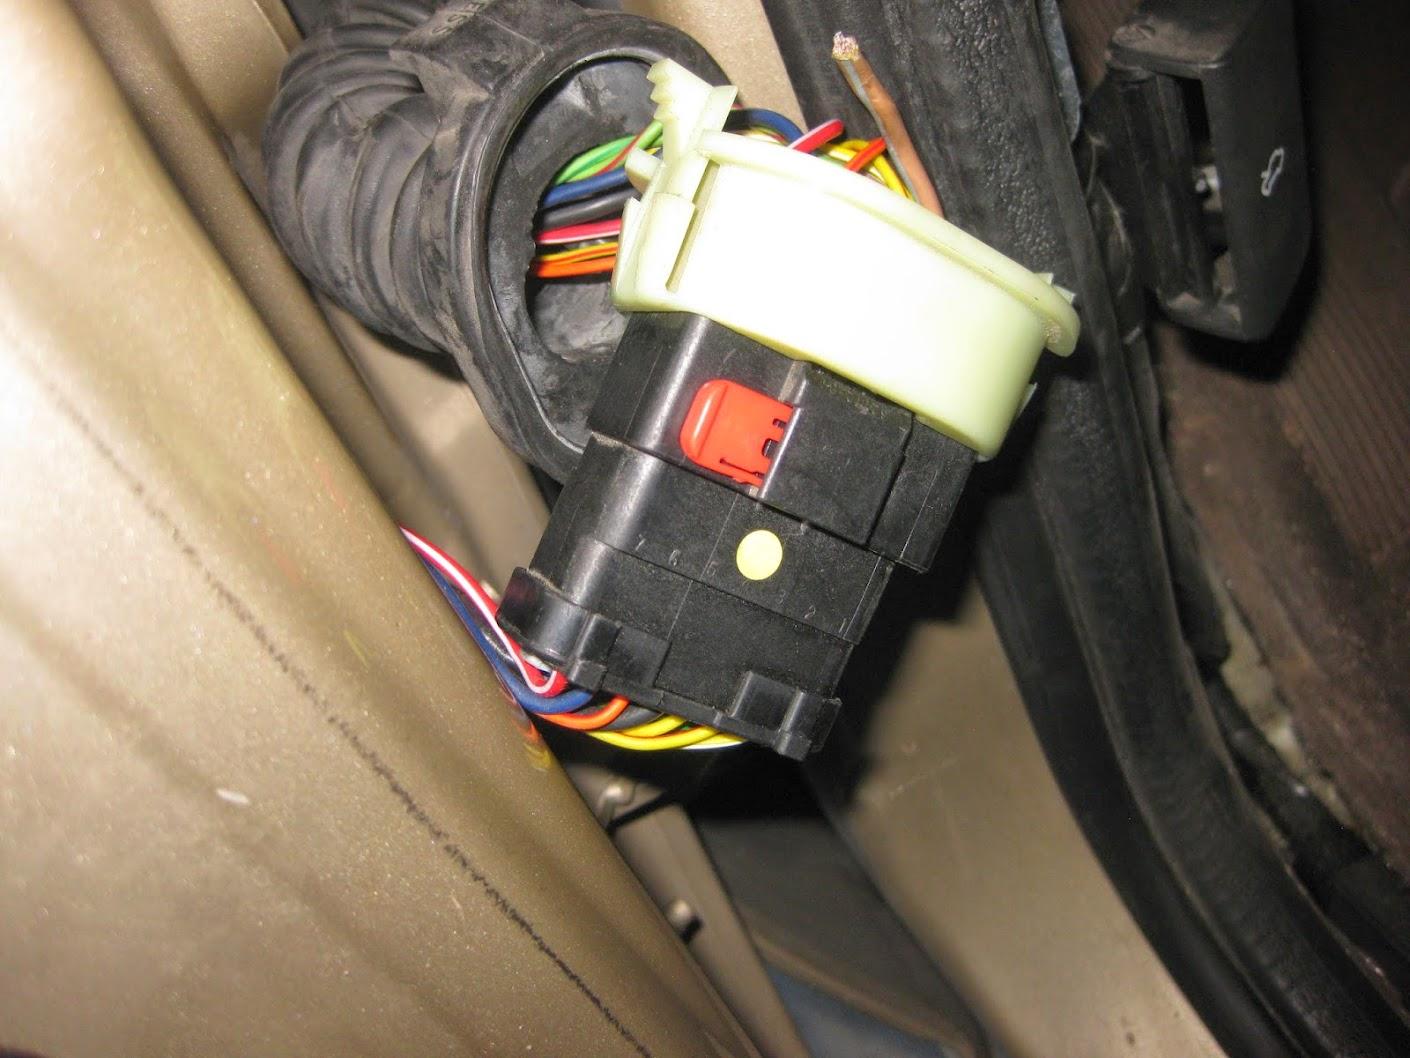 Wj Jeep Door Wiring Harness Fail - Wiring Diagram Direct smash-ambition -  smash-ambition.siciliabeb.it   Wj Jeep Door Wiring Harness Fail      smash-ambition.siciliabeb.it